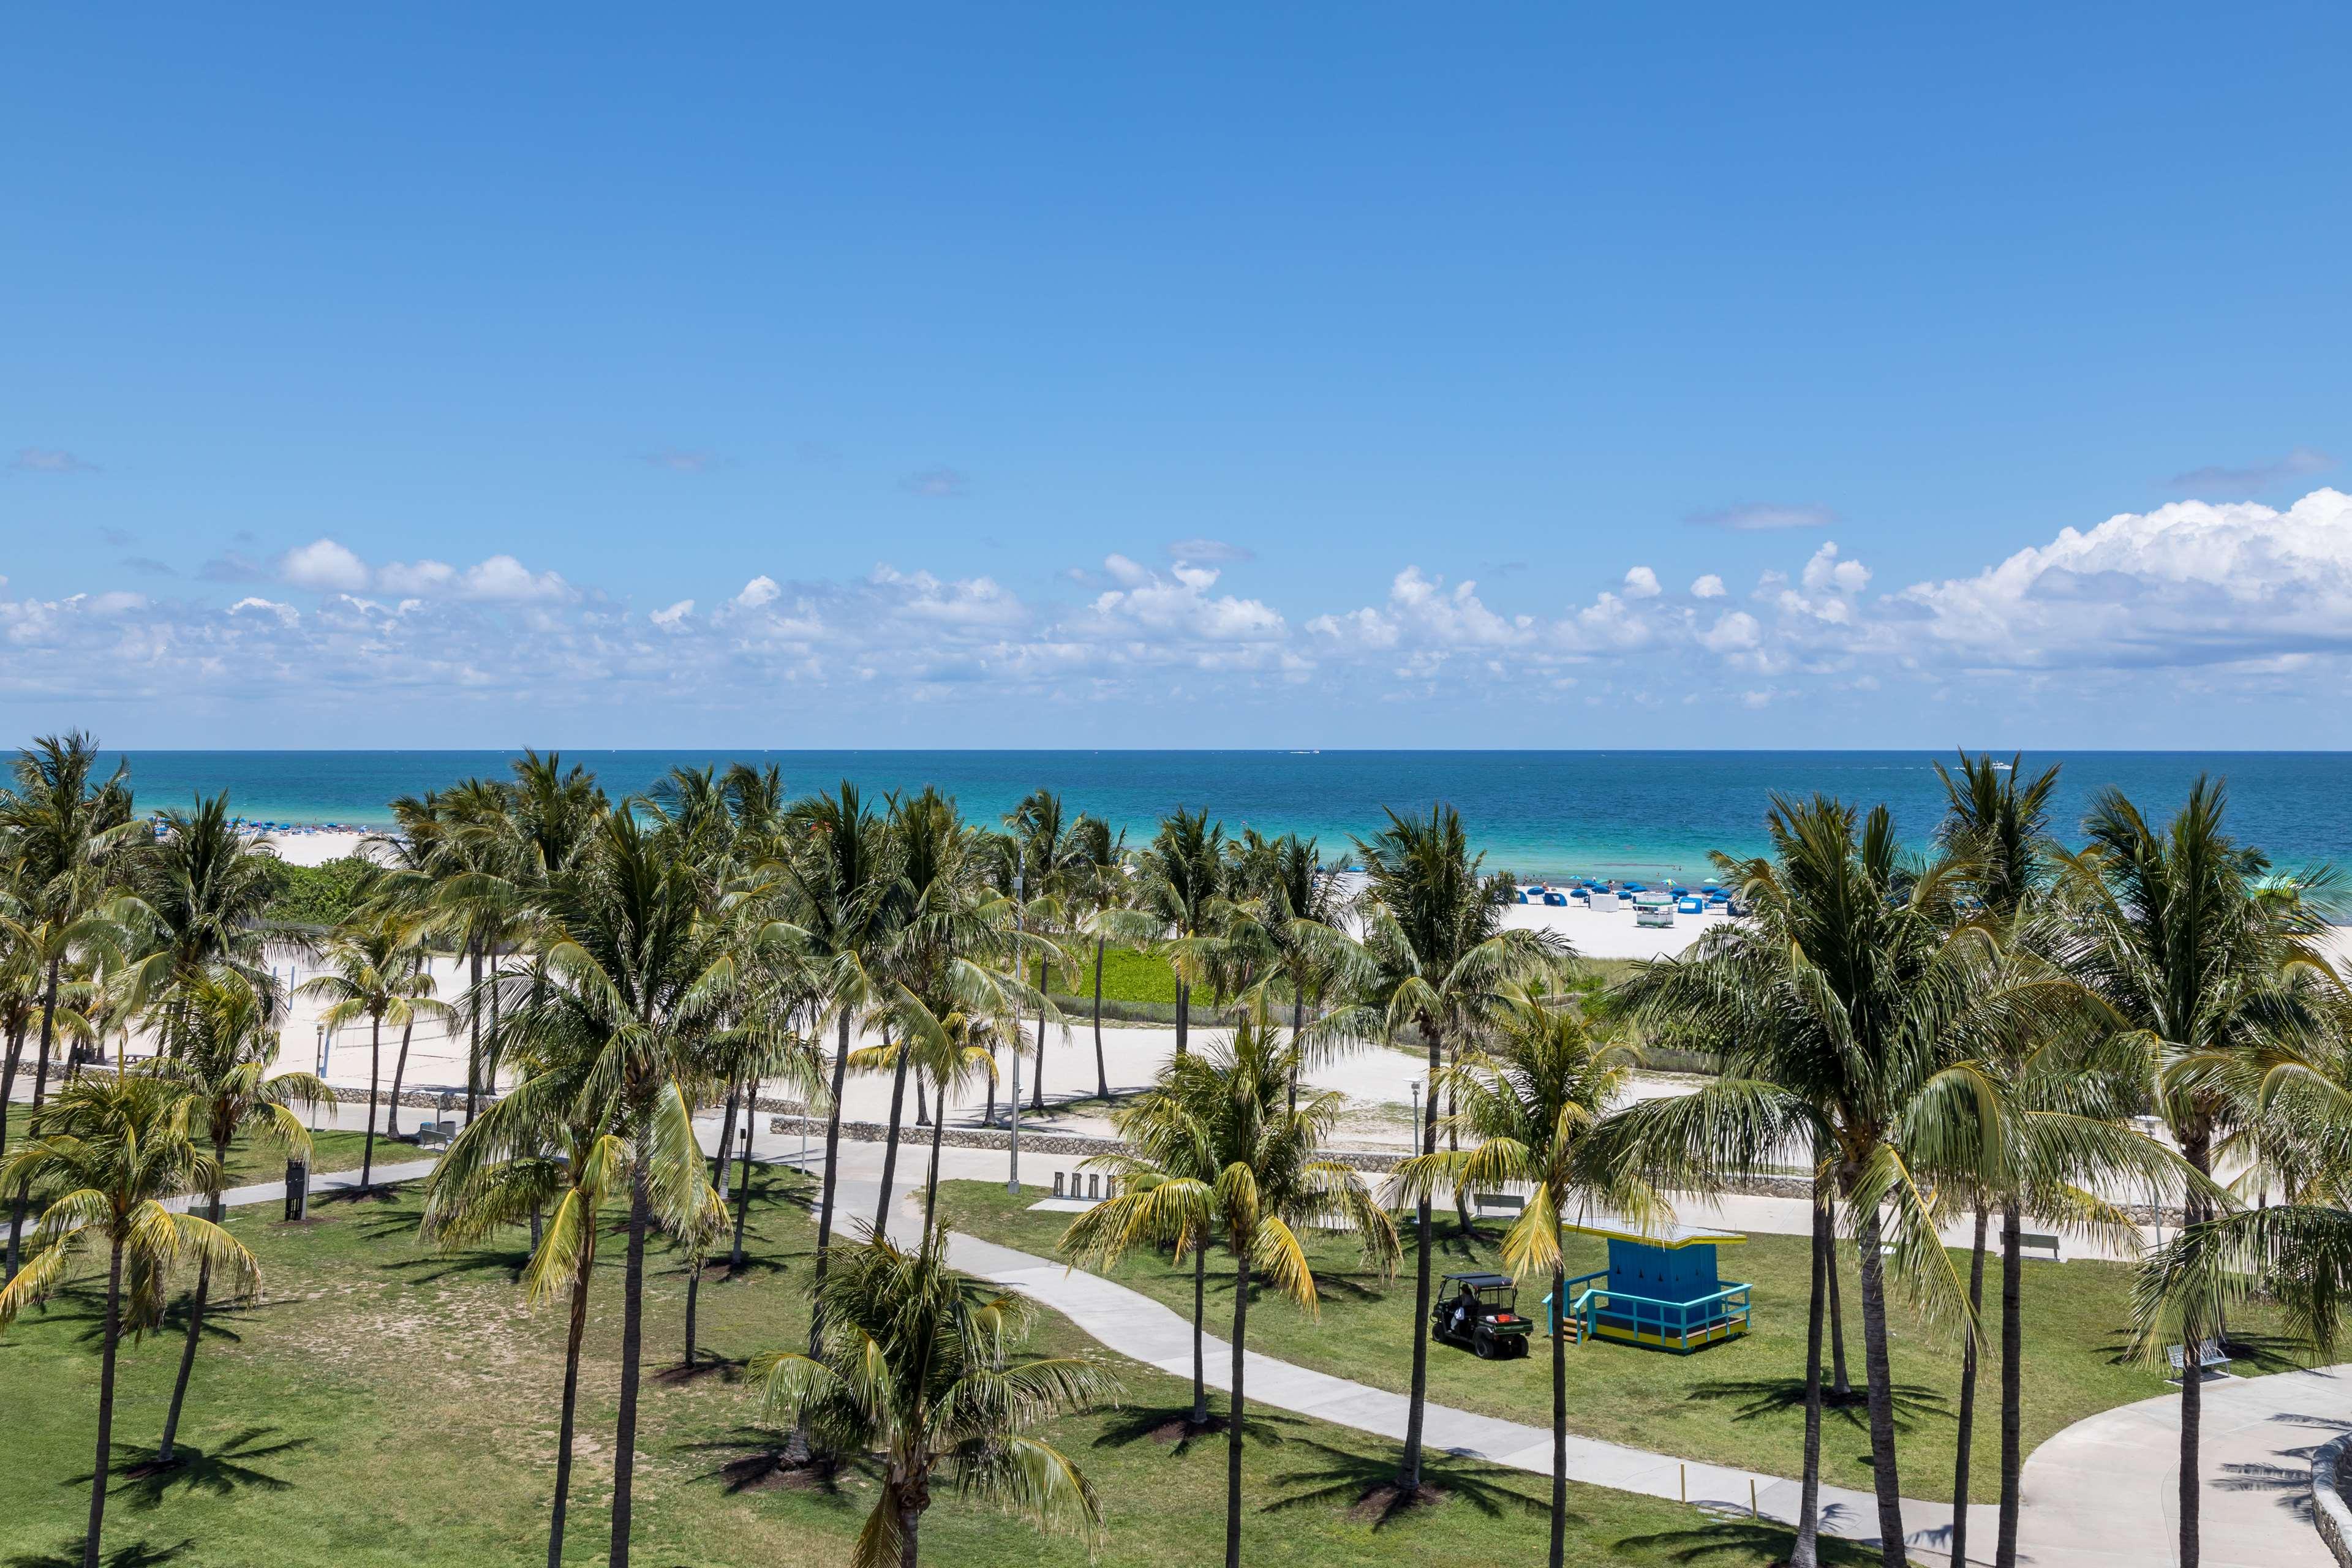 The Gabriel Miami South Beach, Curio Collection by Hilton